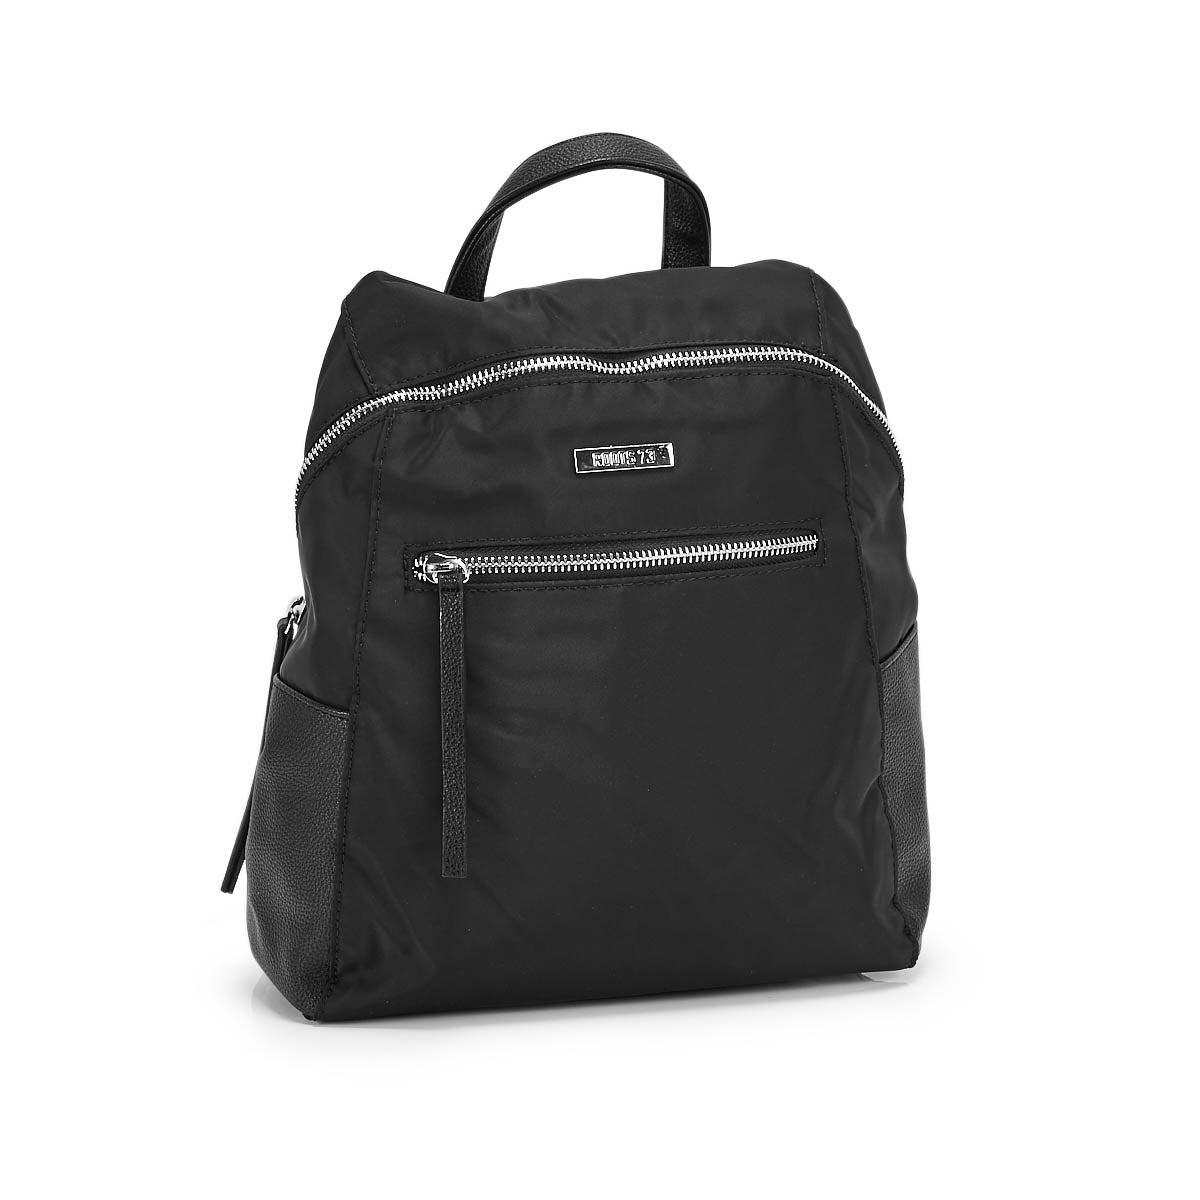 Lds Roots73 black mini backpack